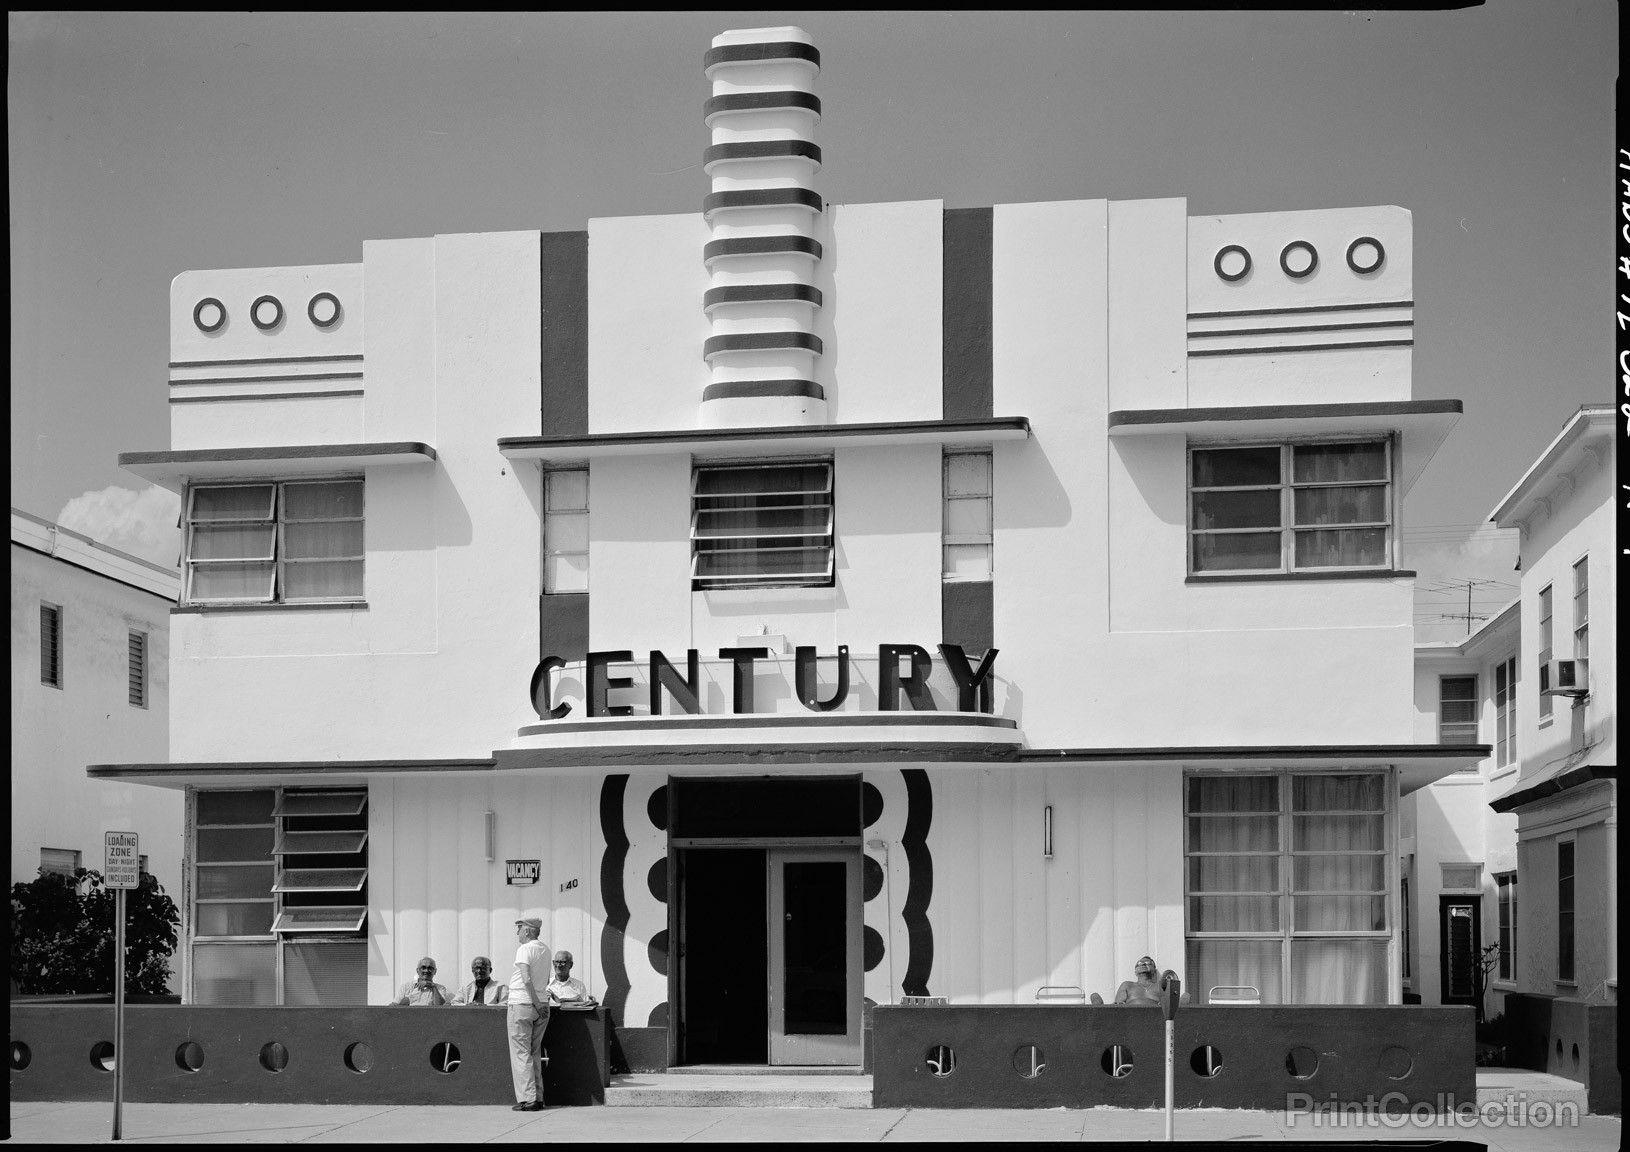 Century hotel 140 ocean drive miami fl fachadas de for Fachadas de casas en miami florida